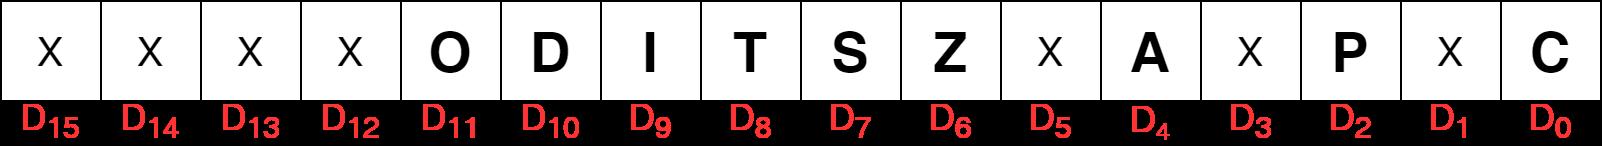 8086 Microprocessor Flag Register